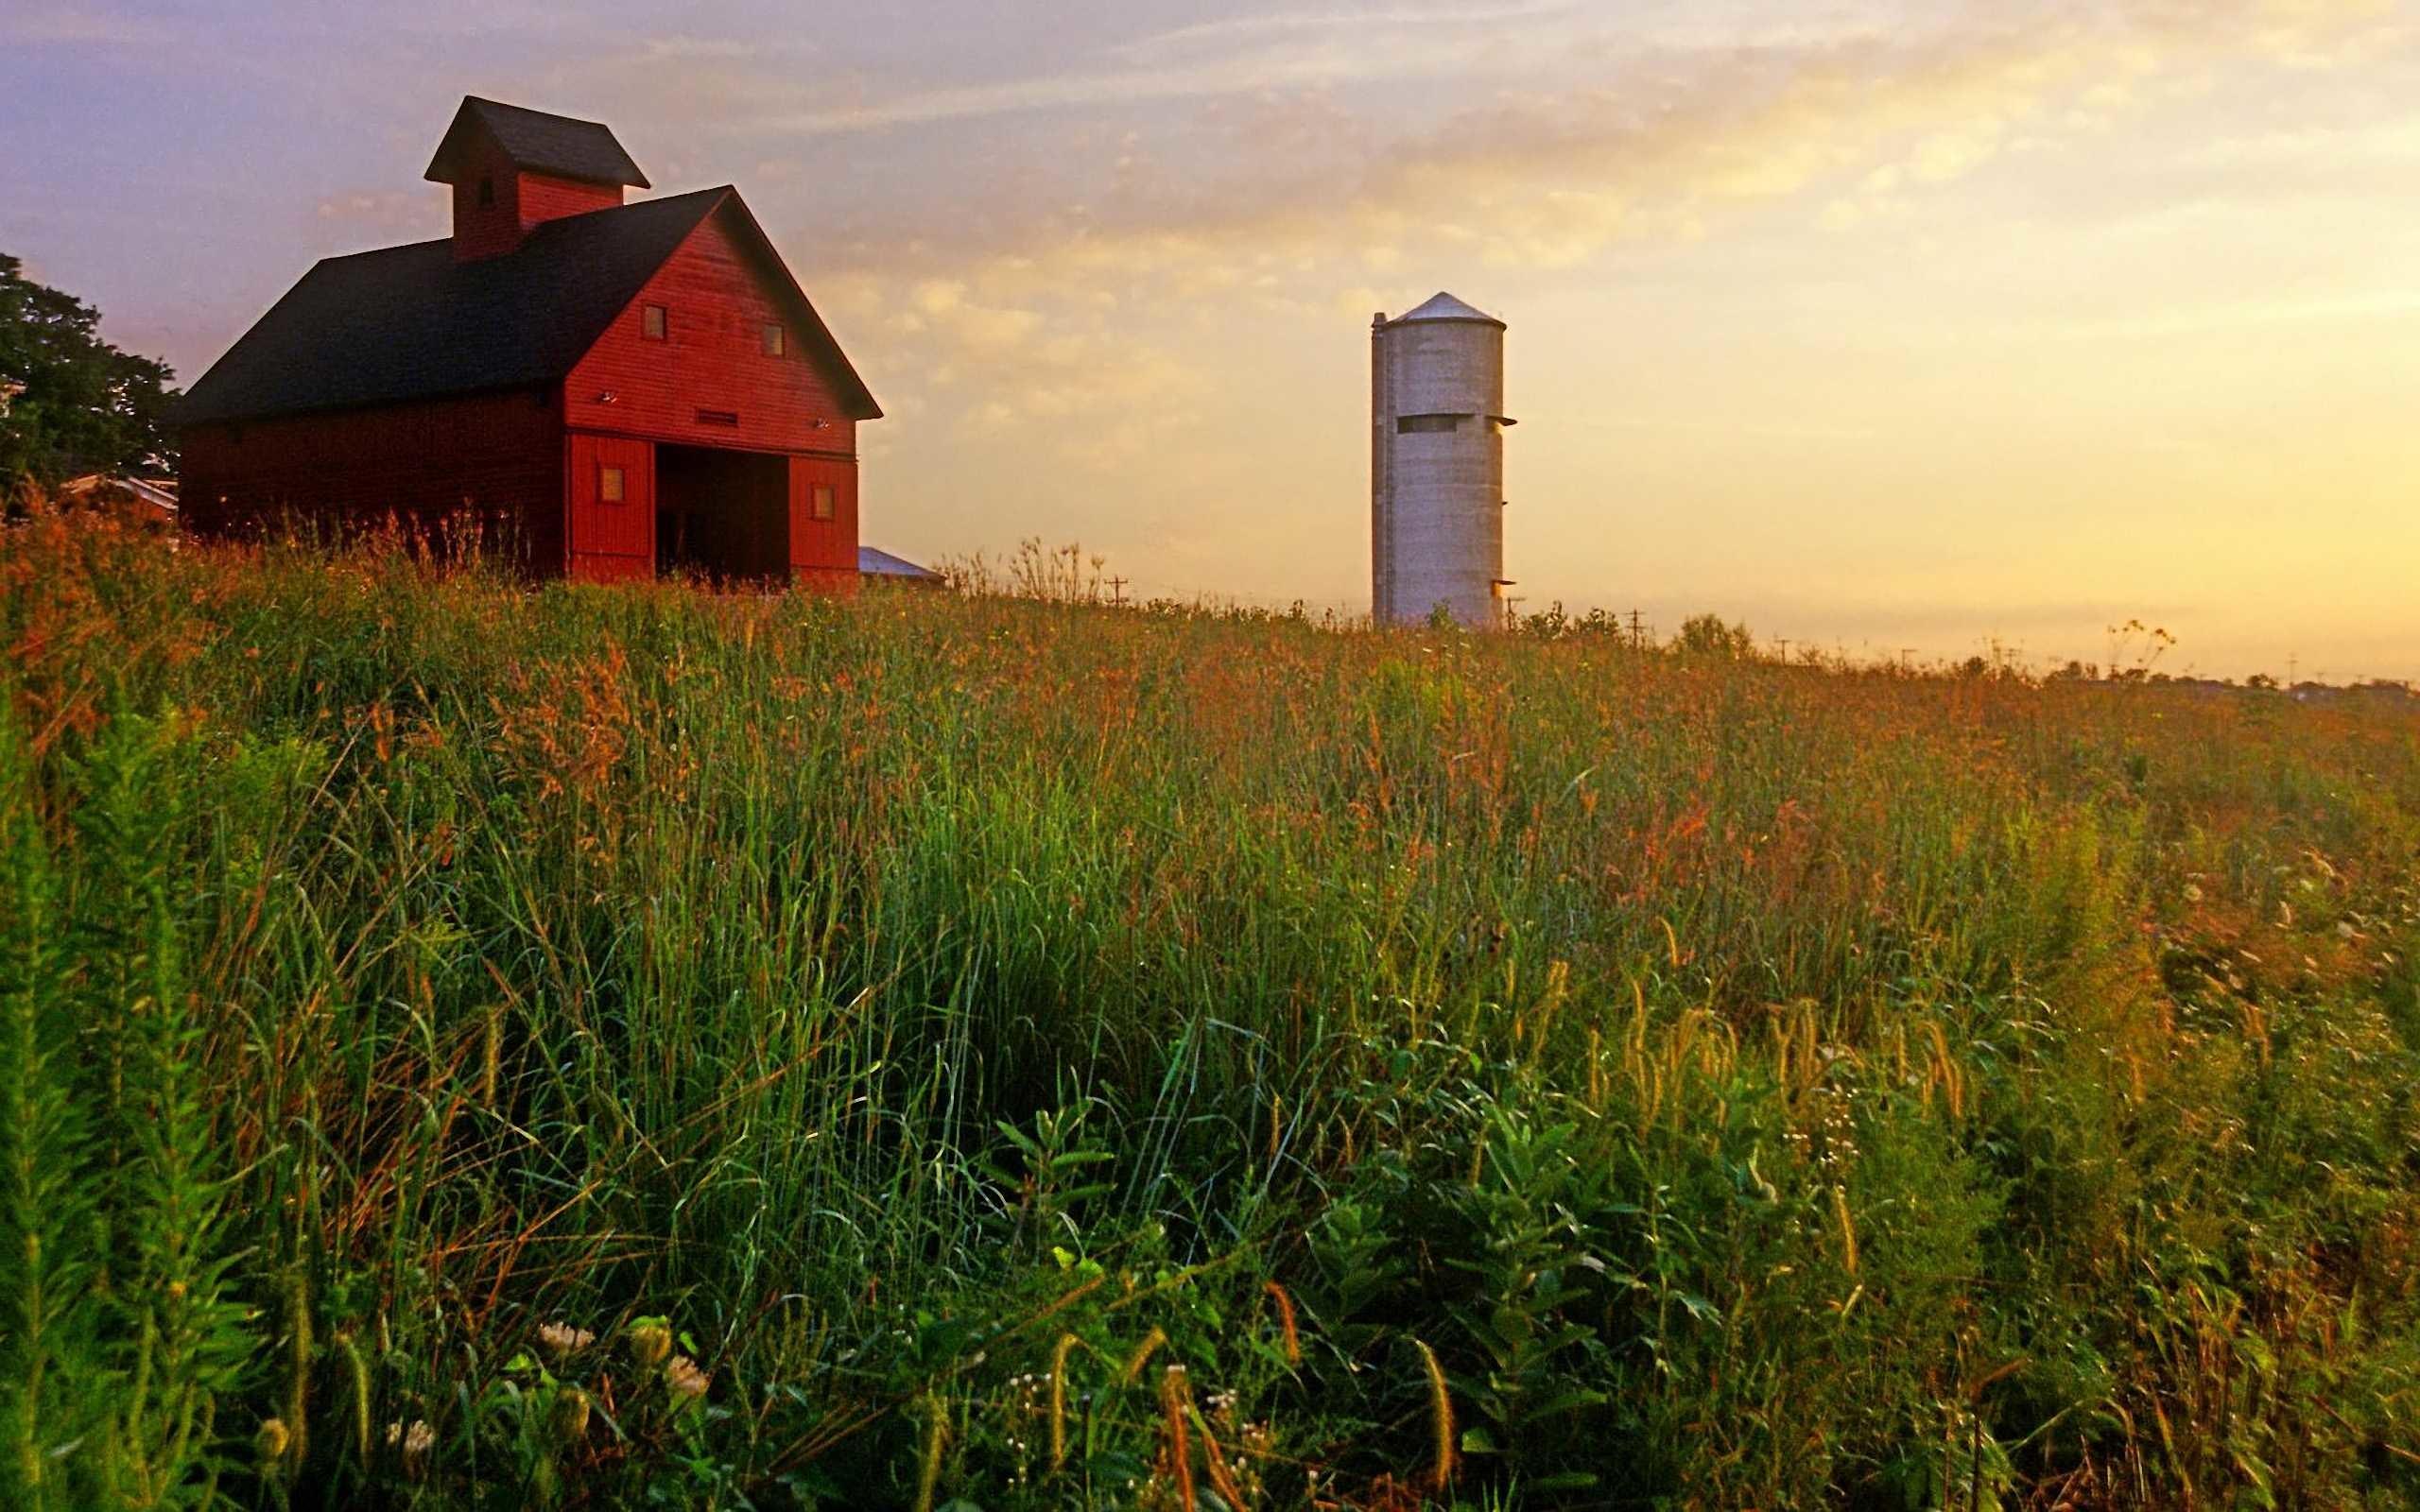 Peck Farm Granary and Silo, Kane County, Illinois